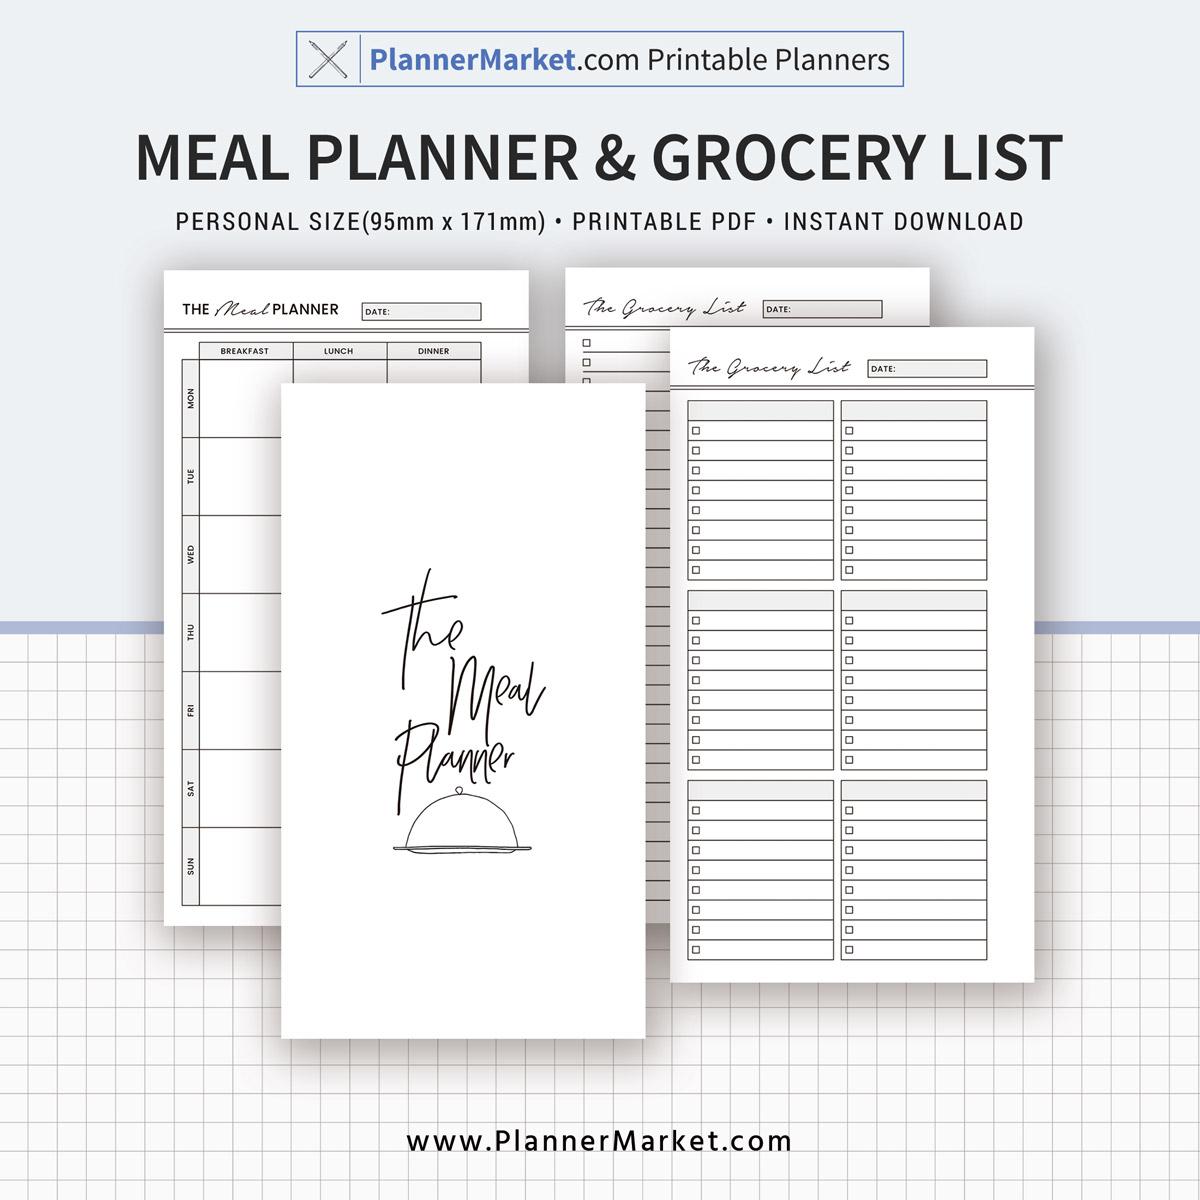 2019 Meal Planner Menu Planner Grocery List Planner Inserts